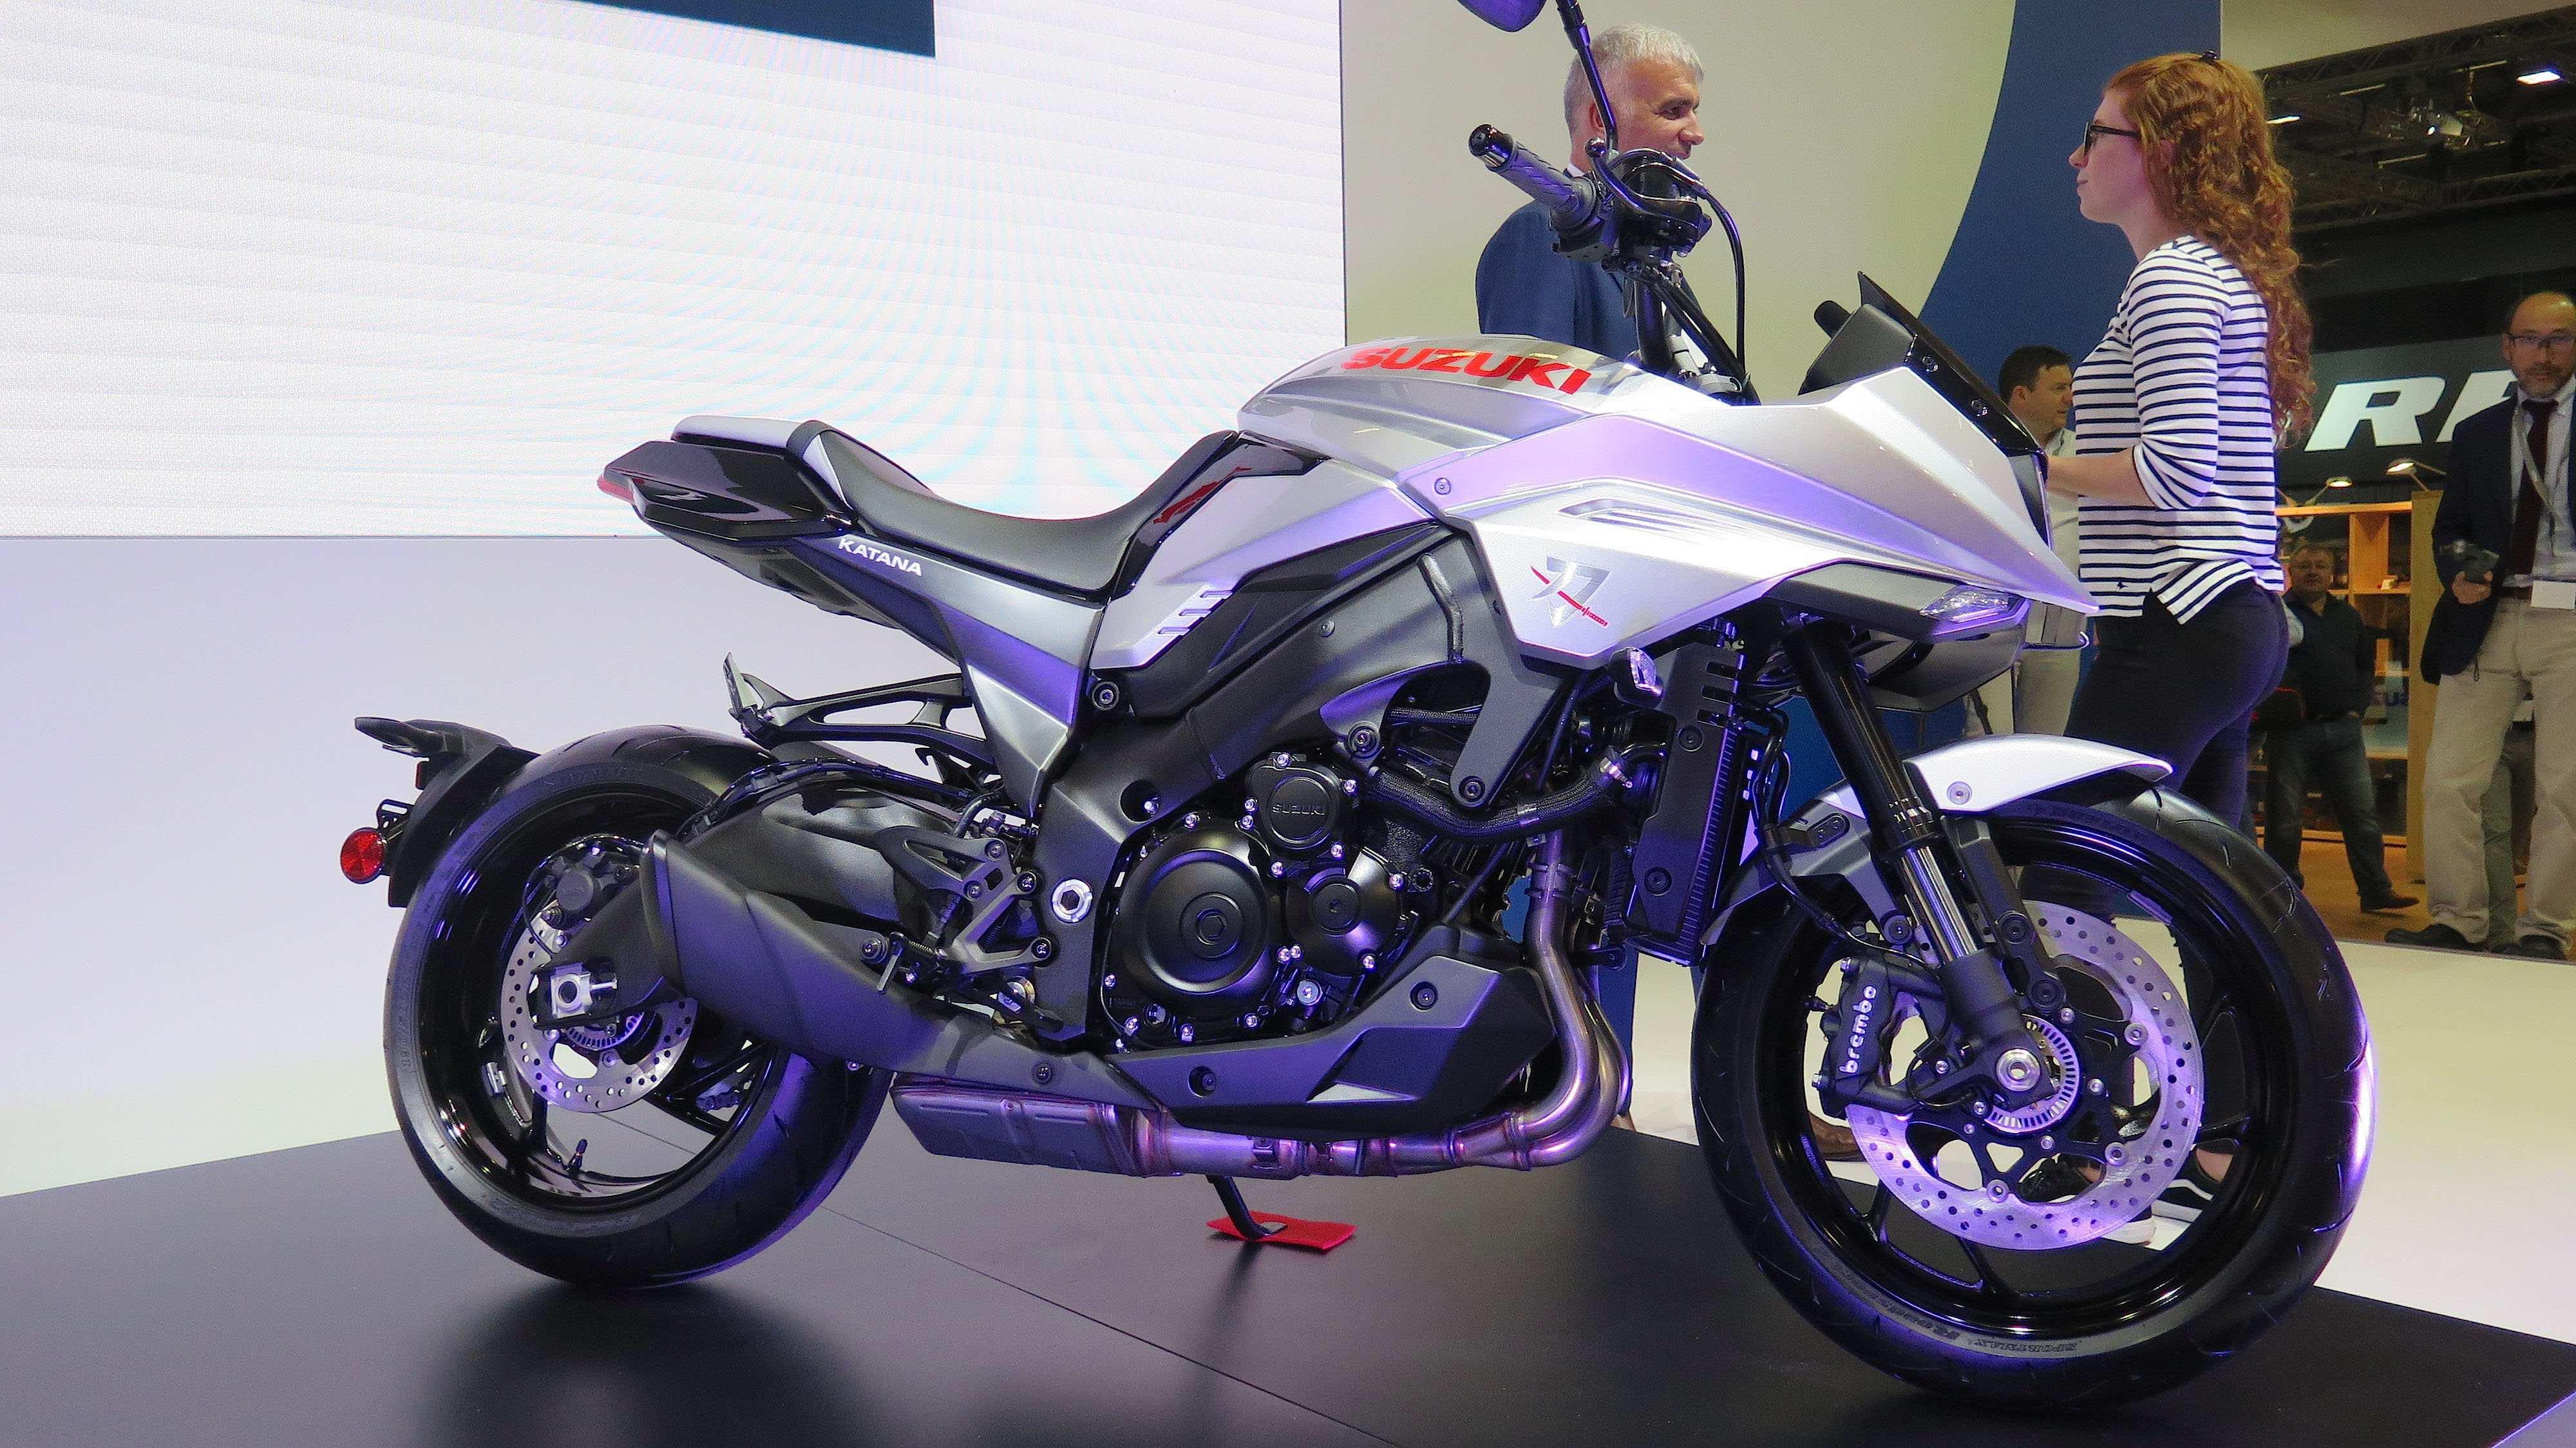 16 Gallery of Motor Suzuki 2020 Reviews with Motor Suzuki 2020